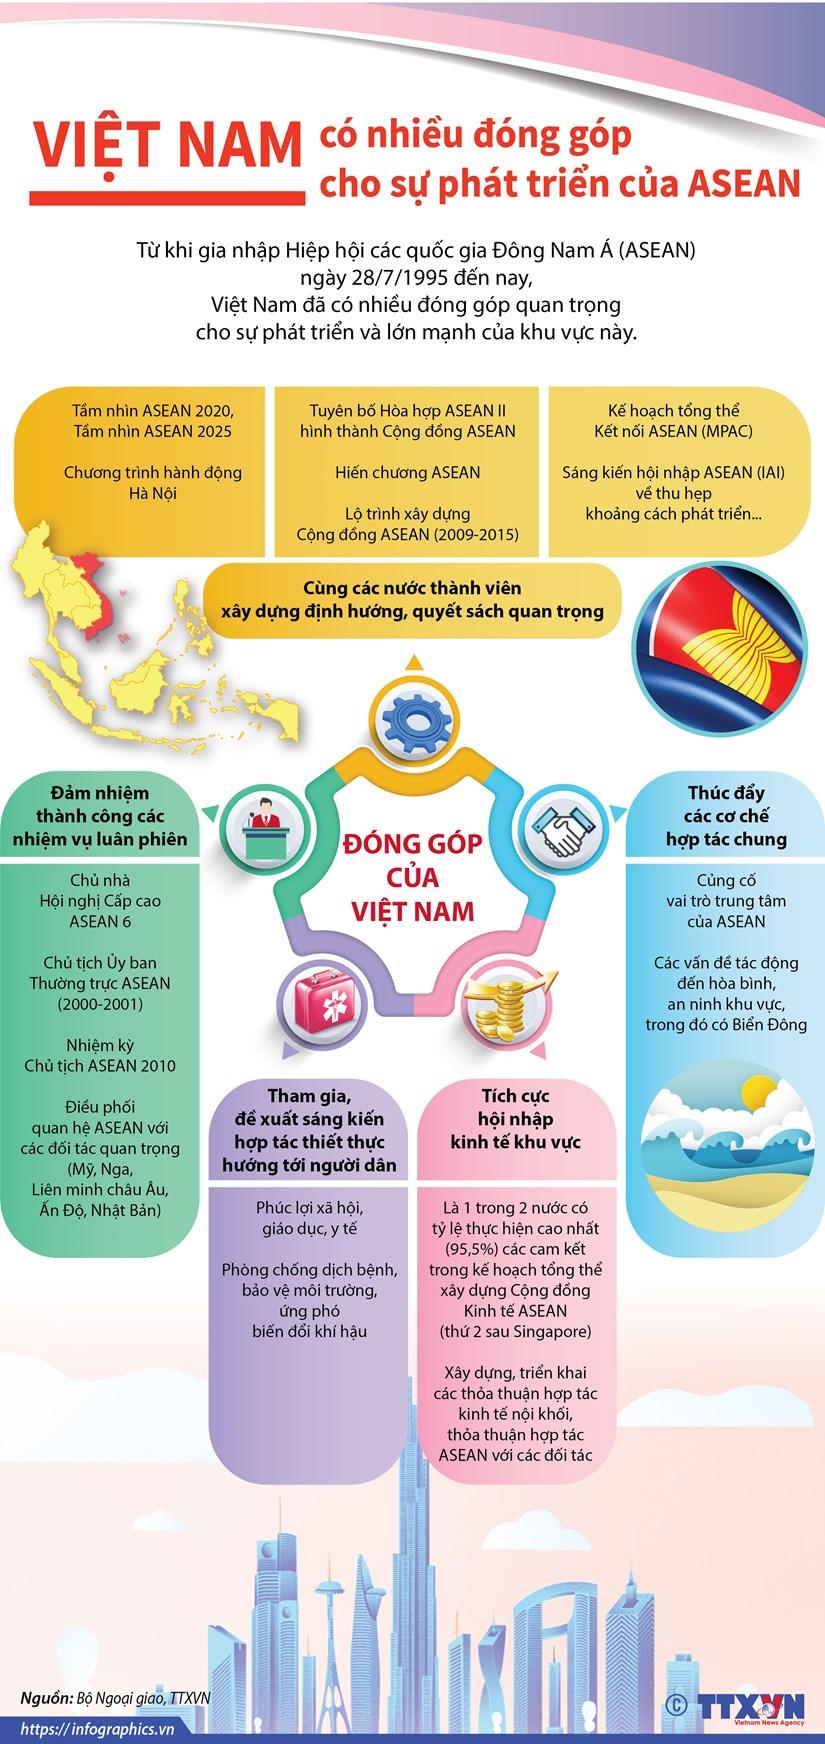 Viet Nam co nhieu dong gop cho su phat trien cua ASEAN hinh anh 1